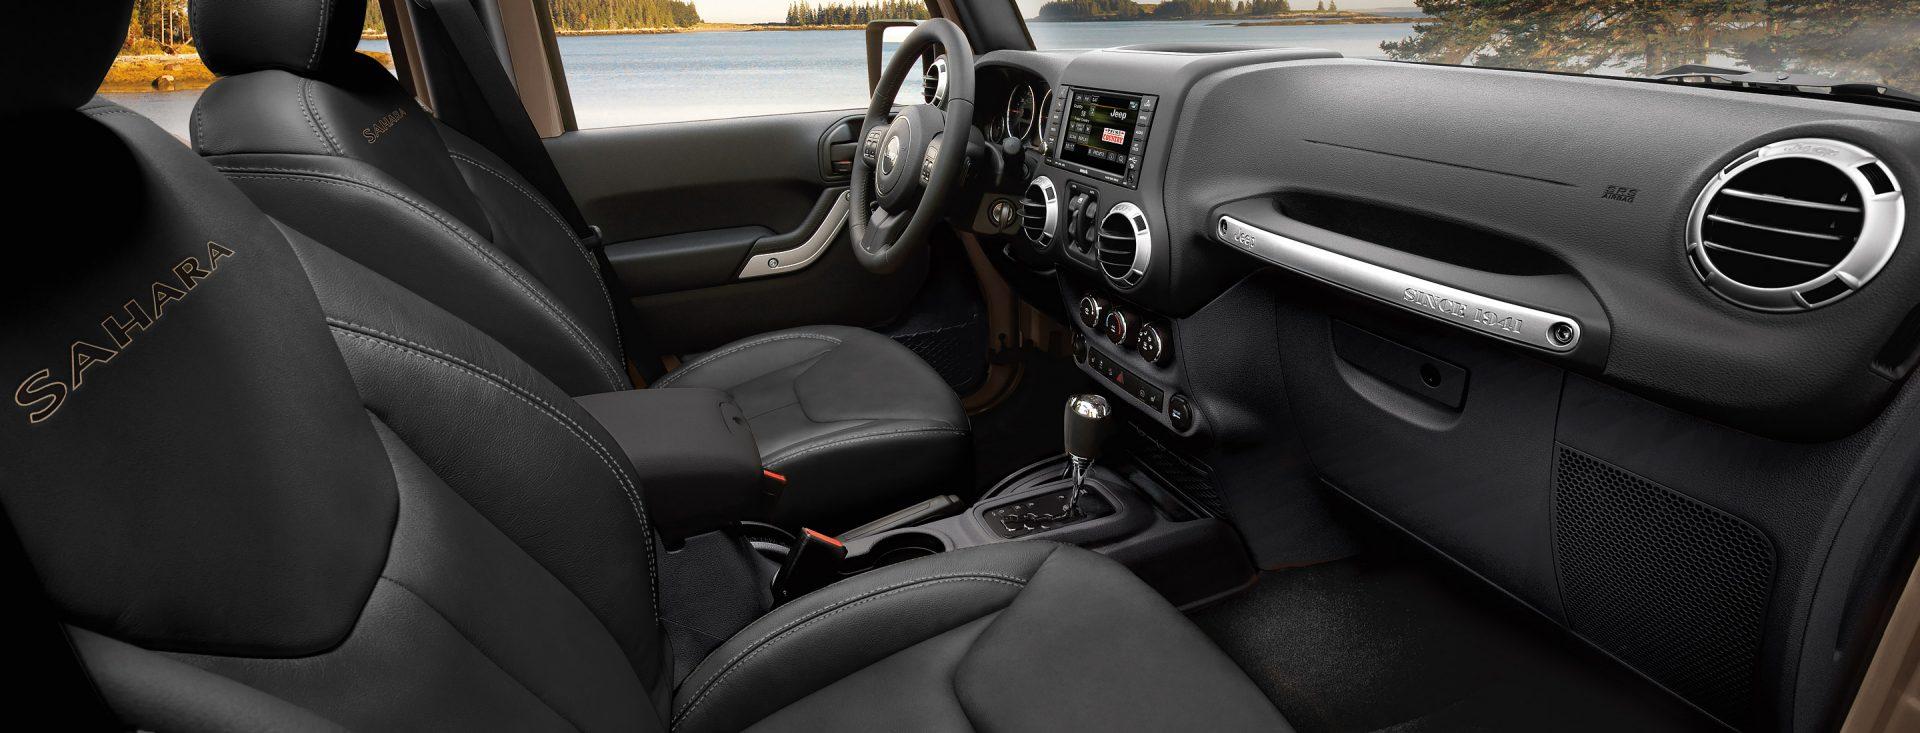 2018 Jeep Wrangler  Interior Features